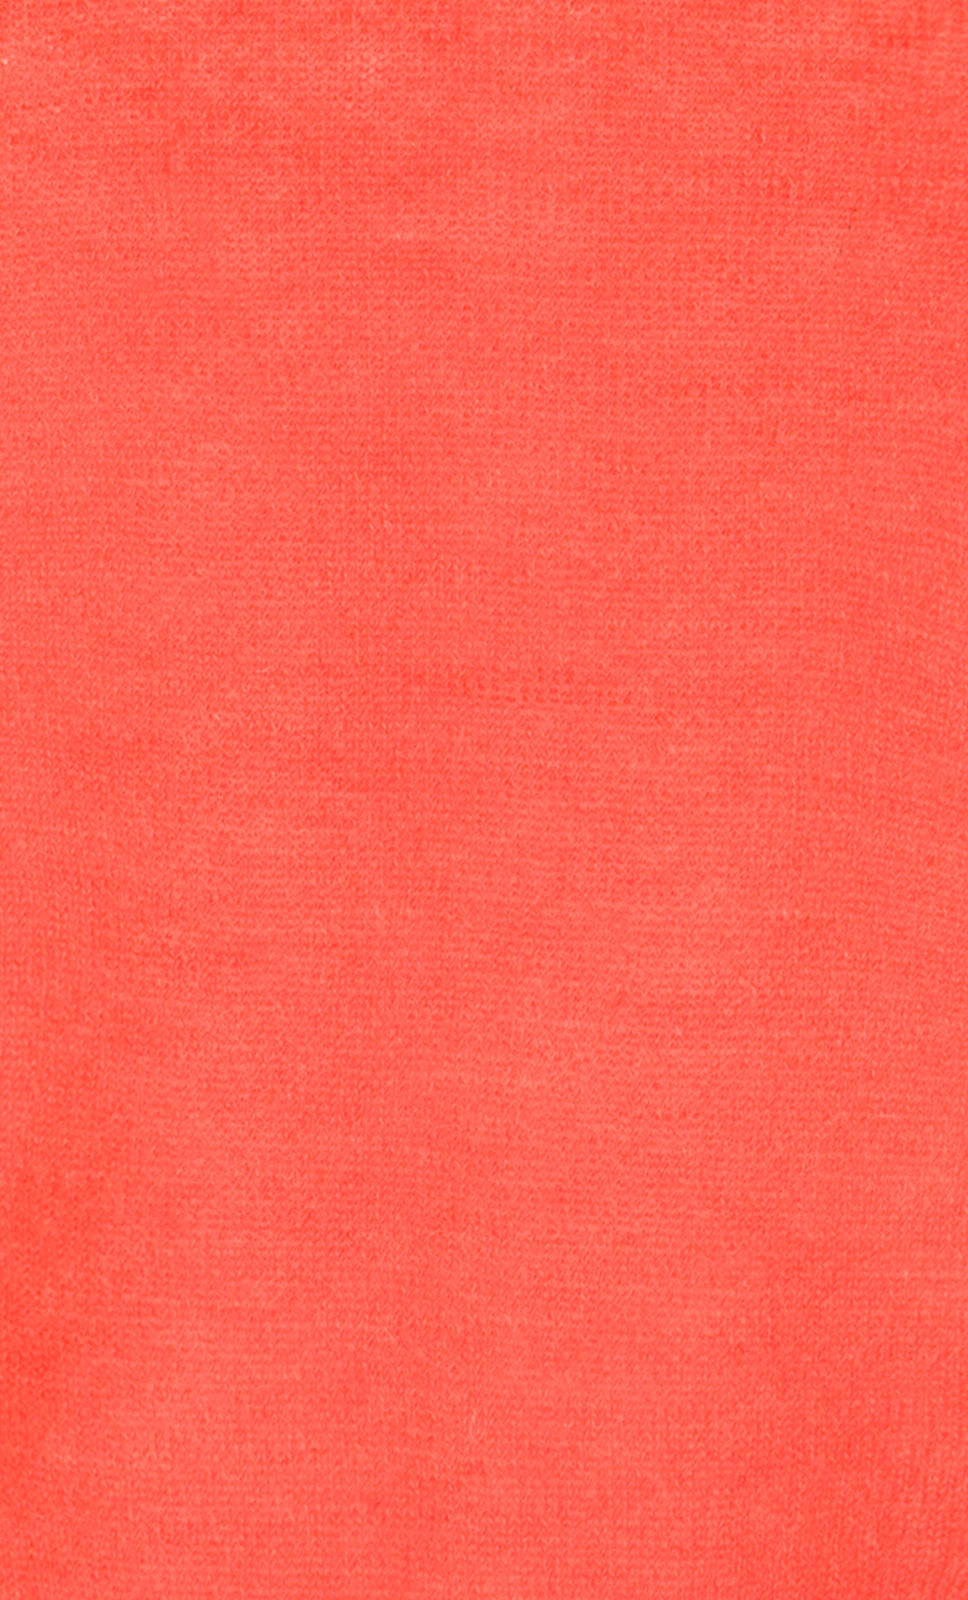 Fluffy-Shell-Orange